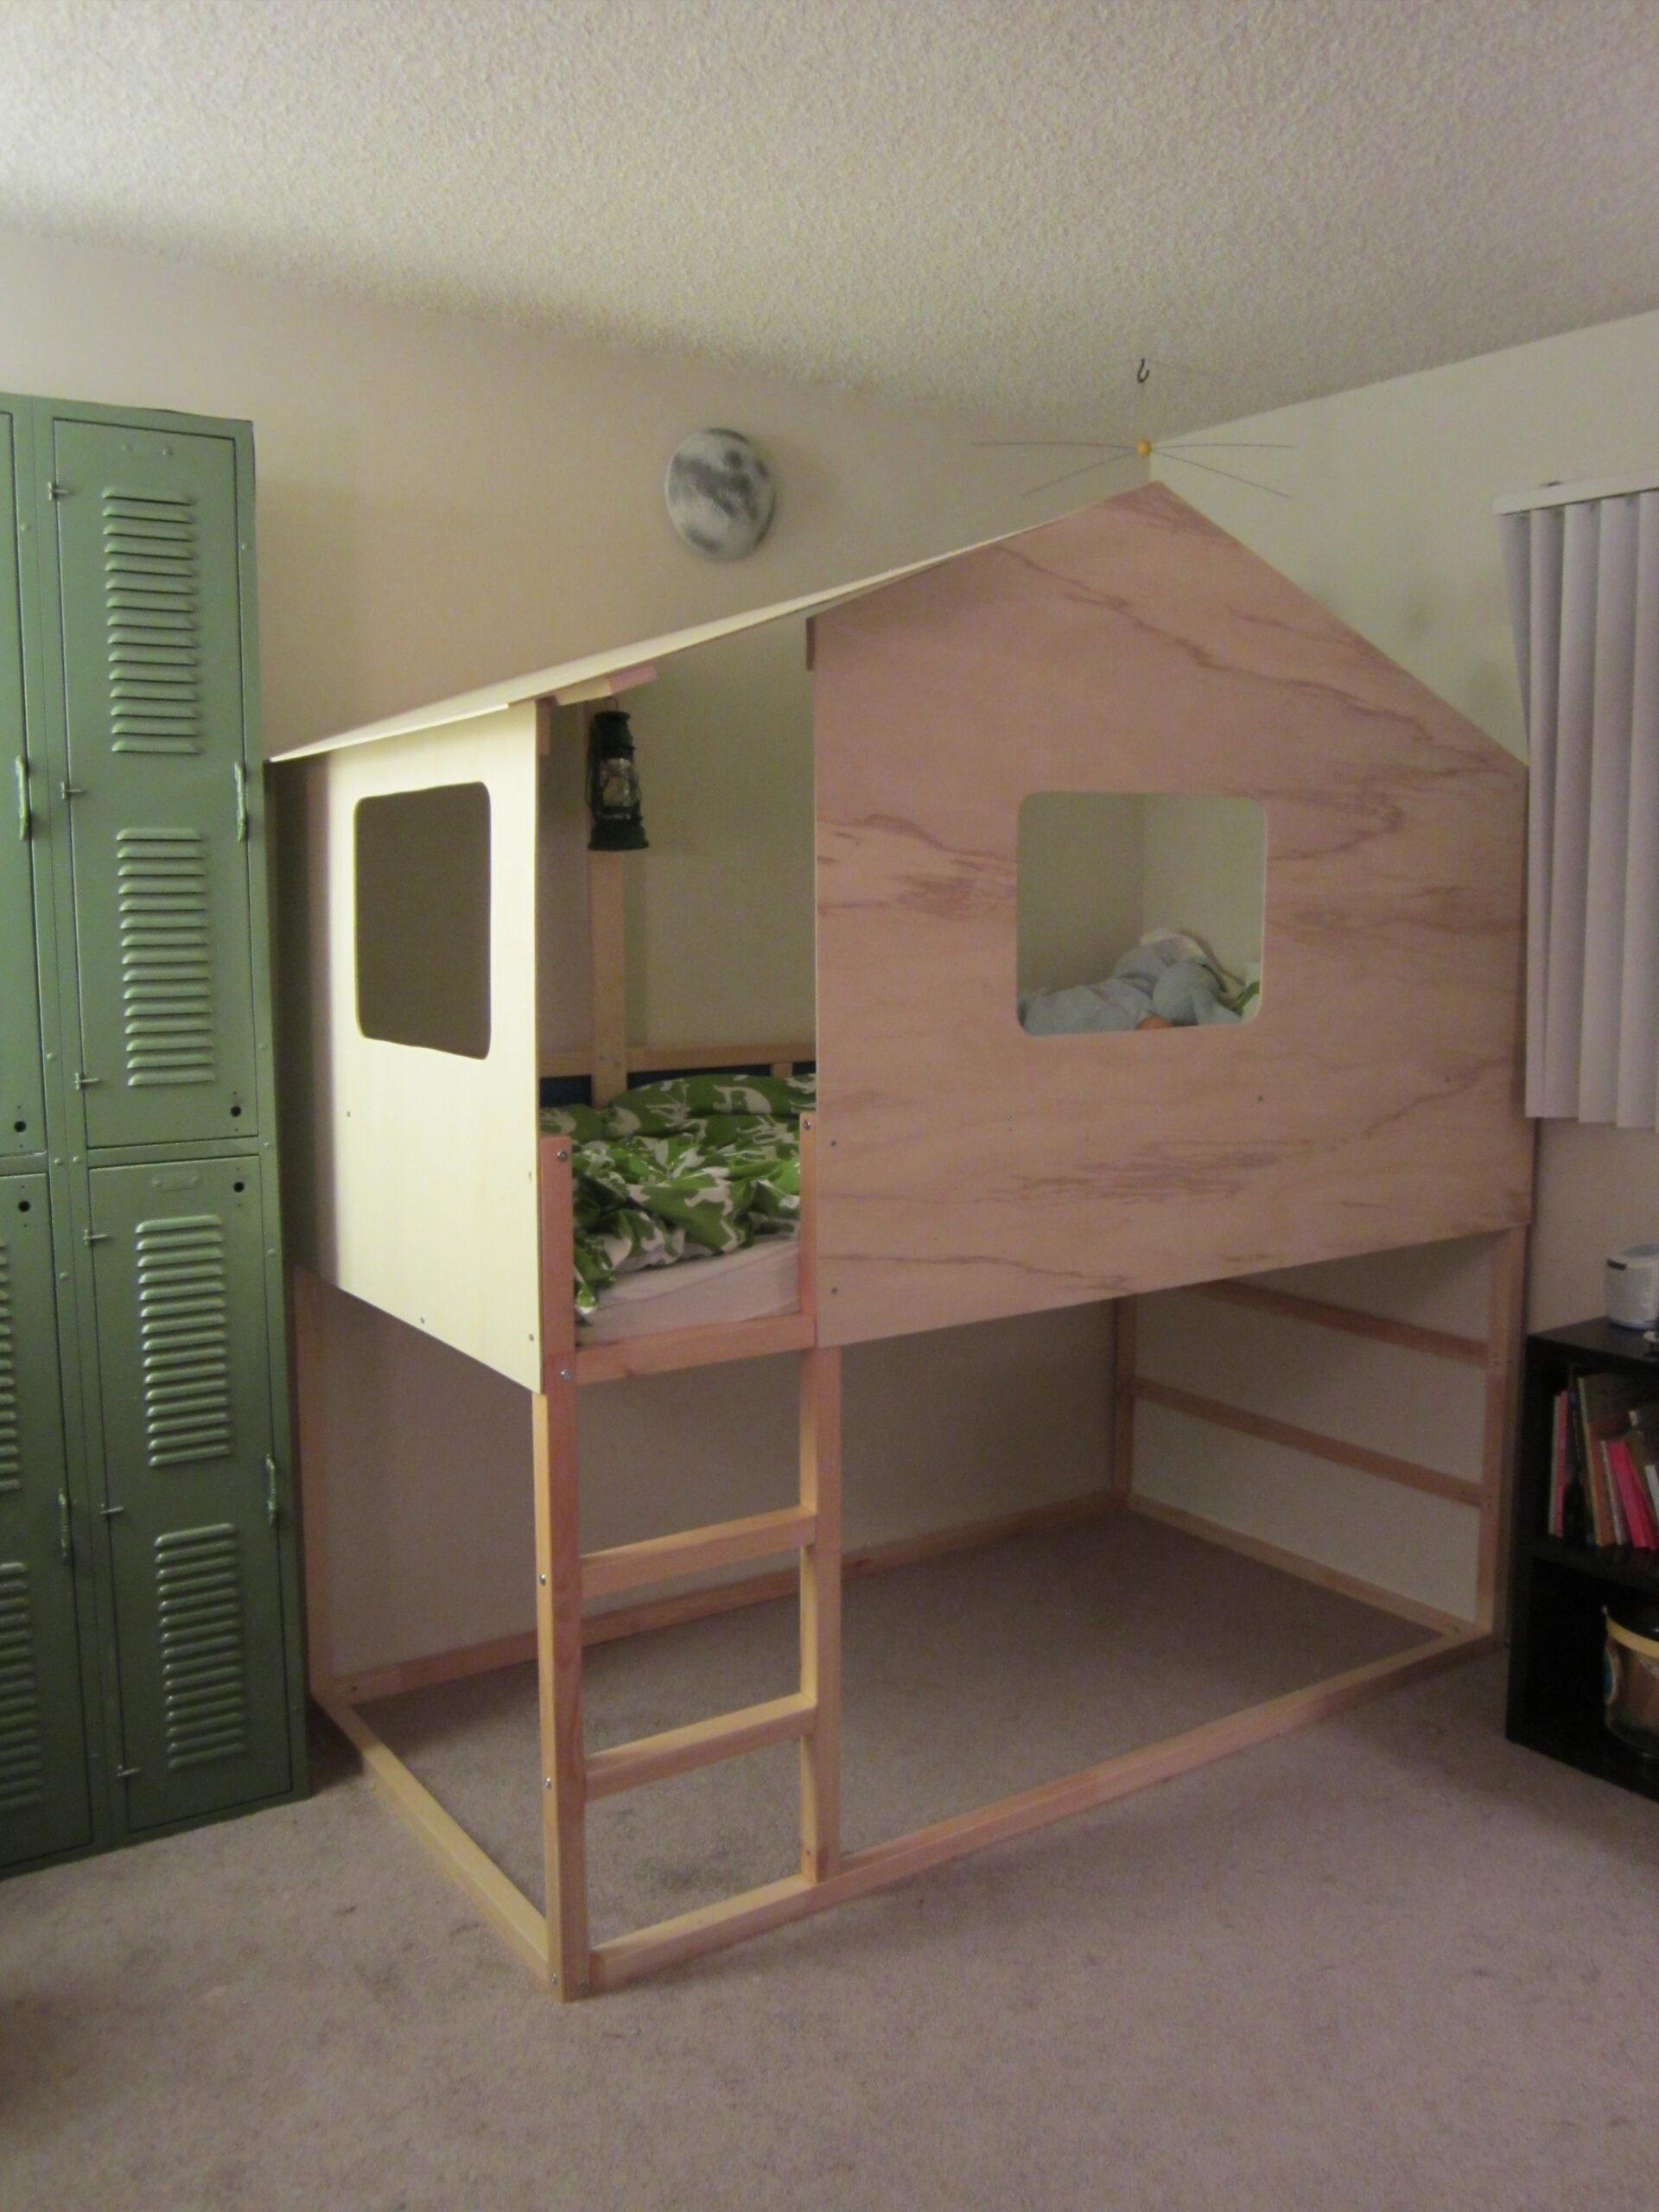 Full Size of Kura Hacks Pinterest Ikea Bed Hack Storage Underneath Drawers Floor Slide House Montessori Into Modern Cabin Vintery Wohnzimmer Kura Hack